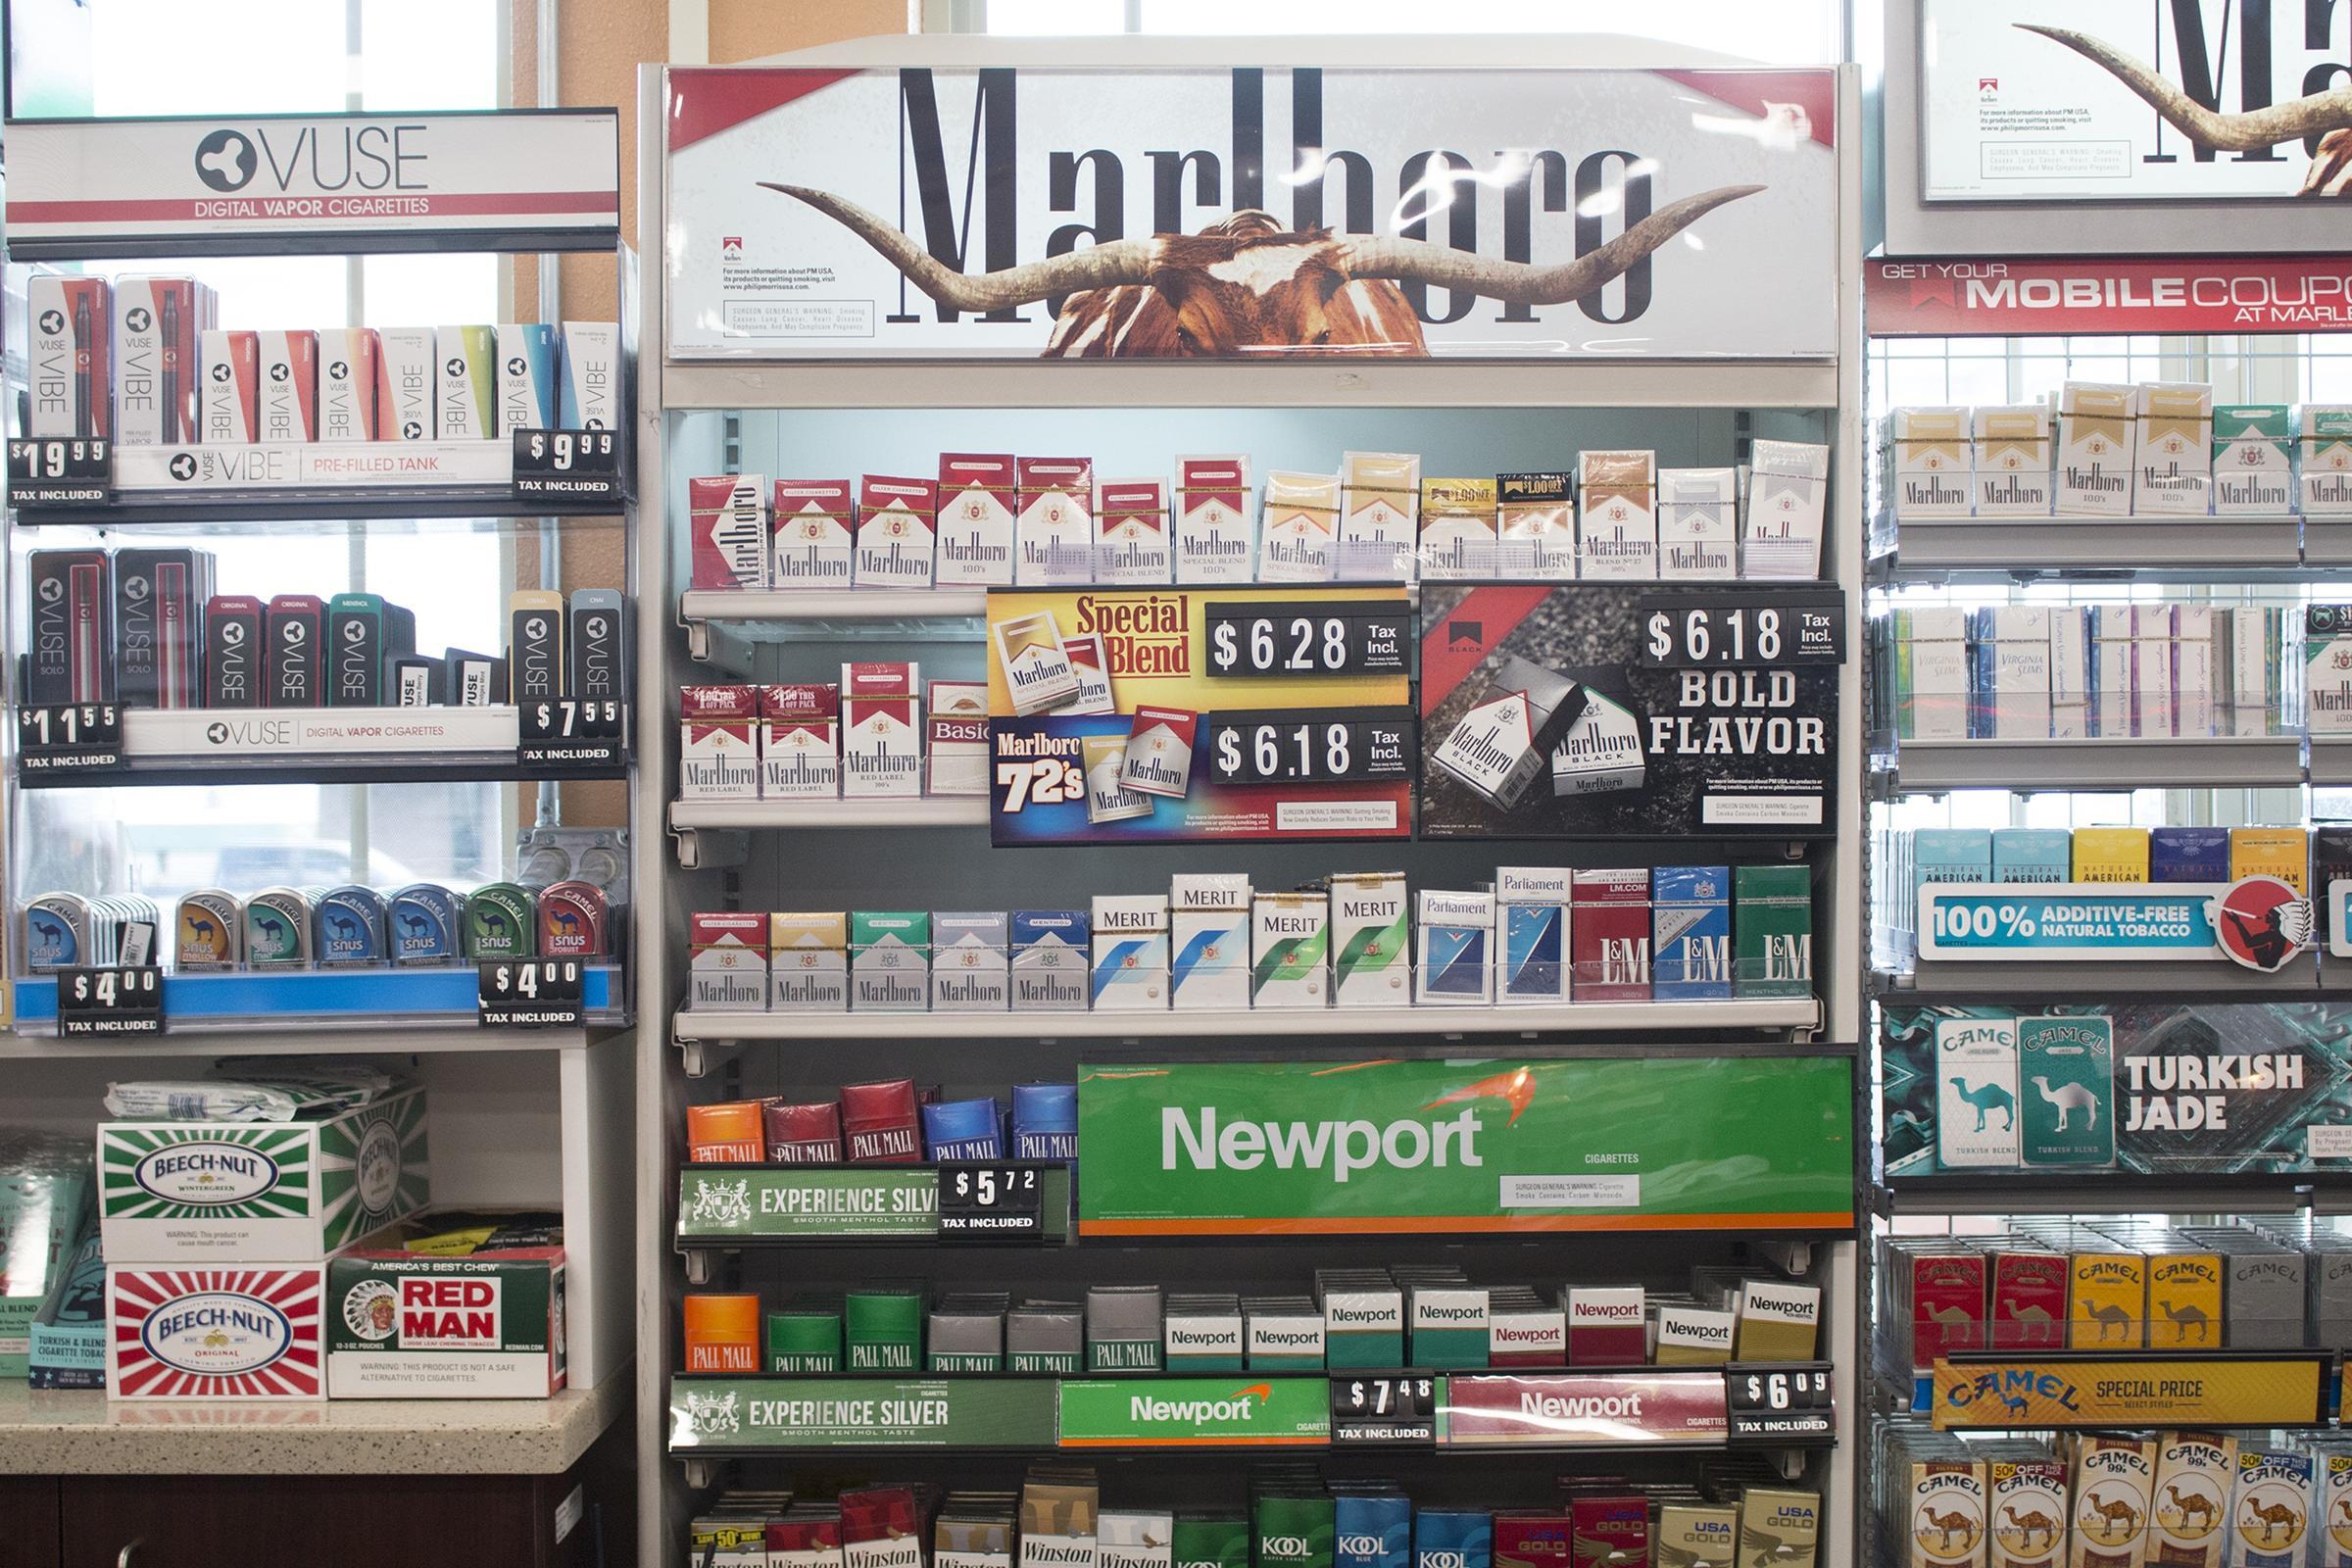 City Council approves $13 minimum price for cigarettes